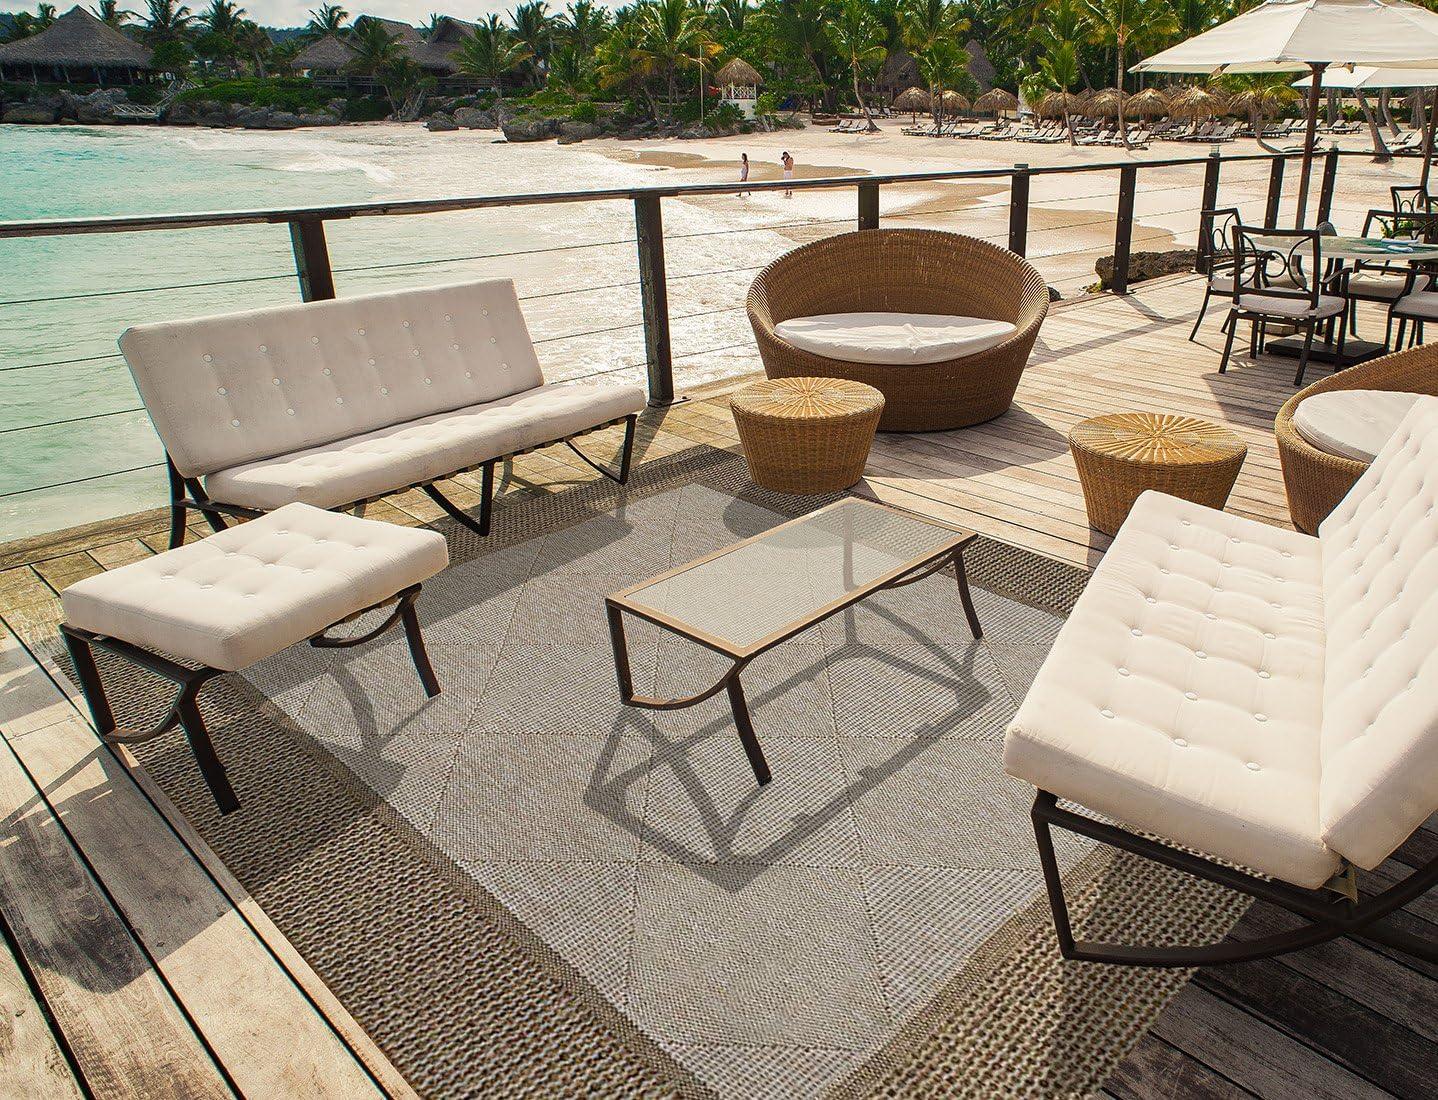 Amazon coupon code for Platinum Furman Modern Outdoor Patio Rug